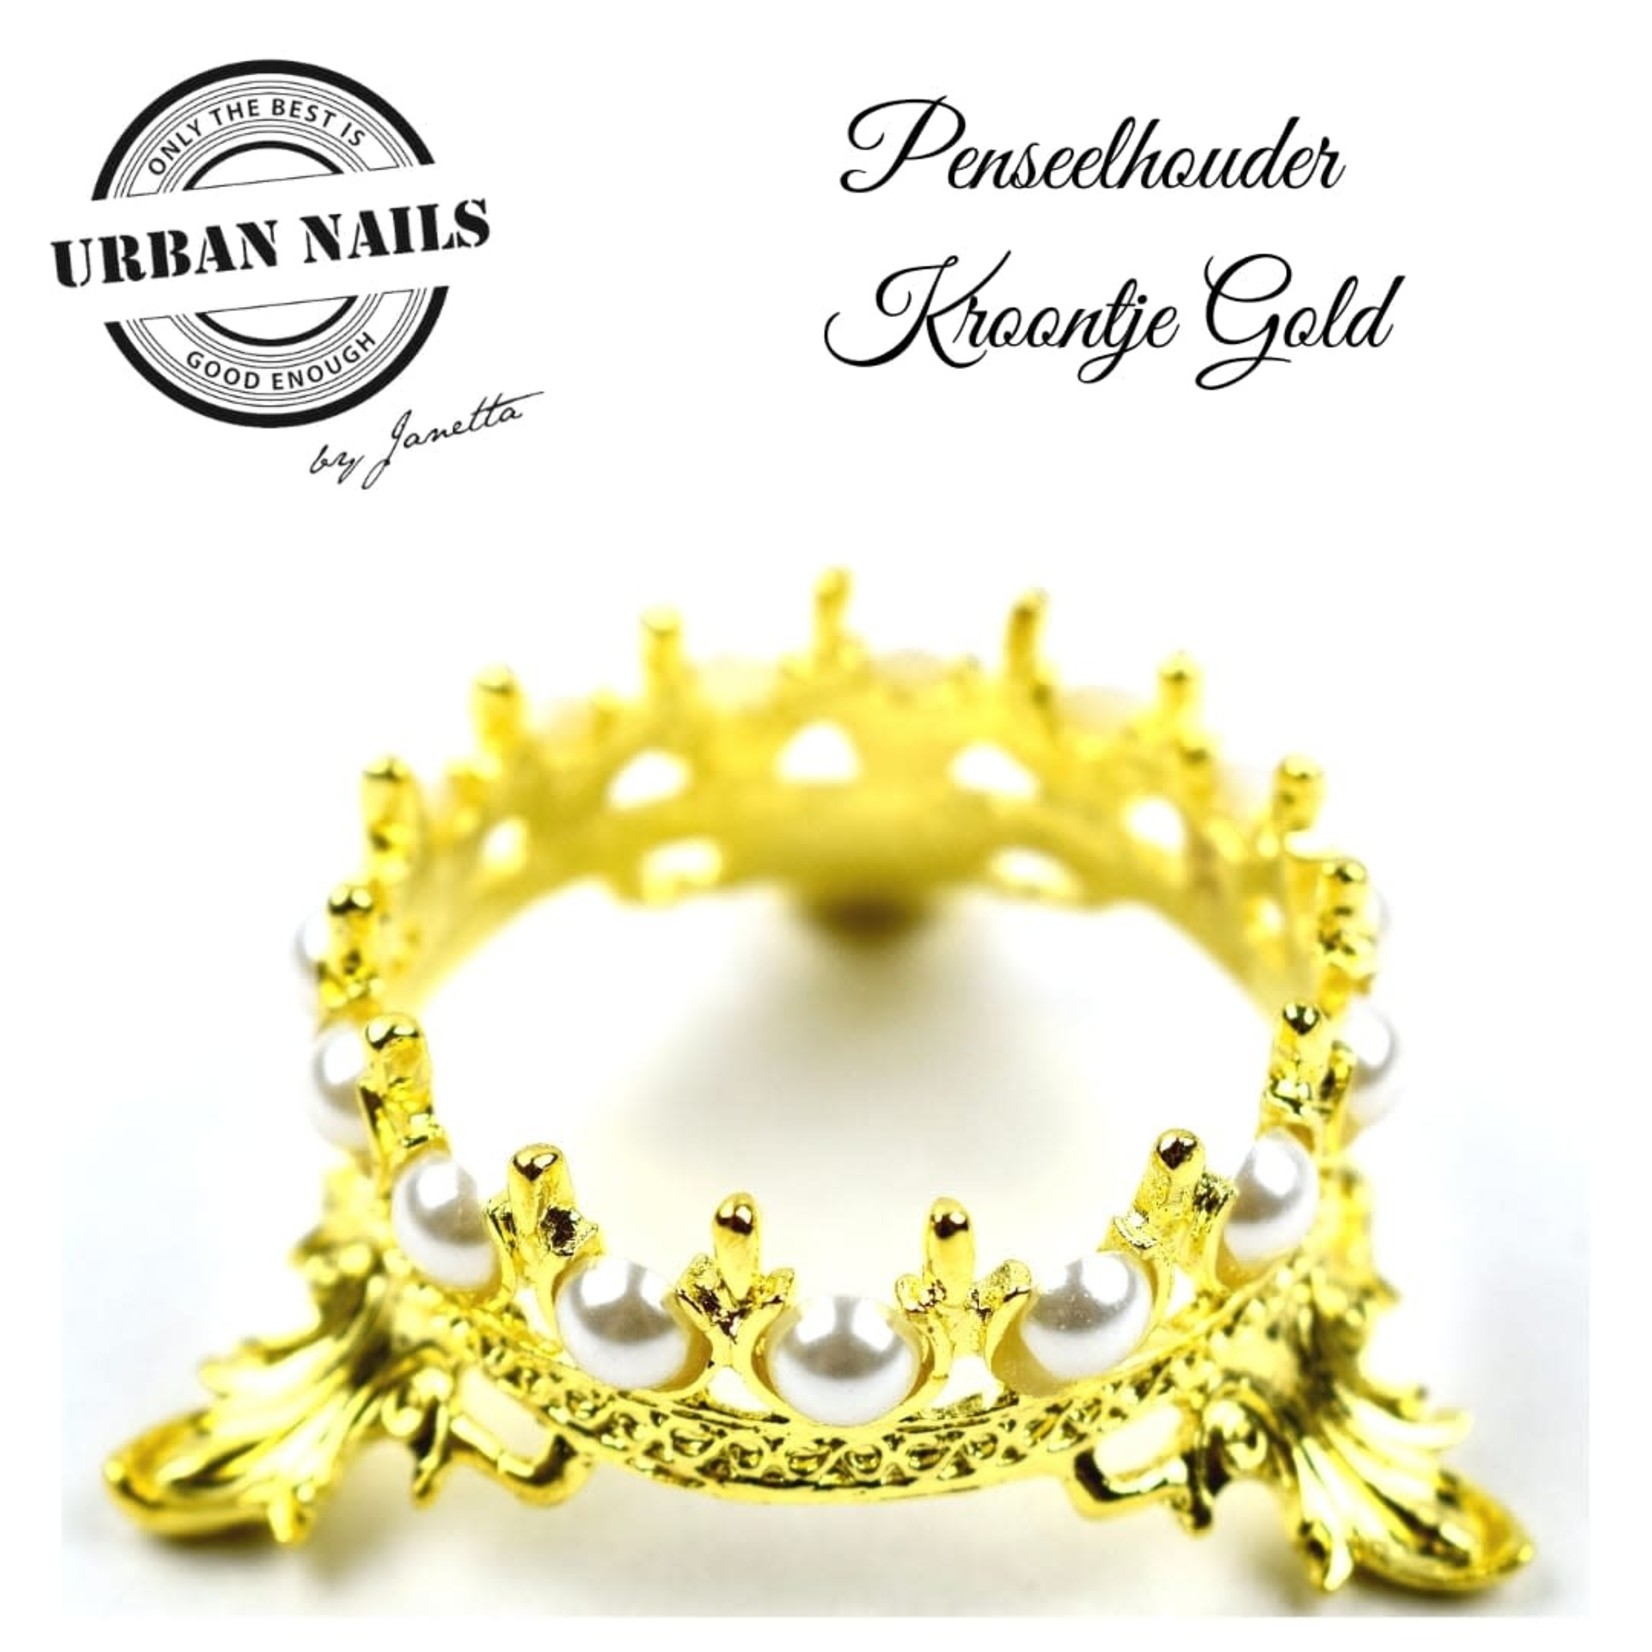 Urban Nails Kroontje Gold